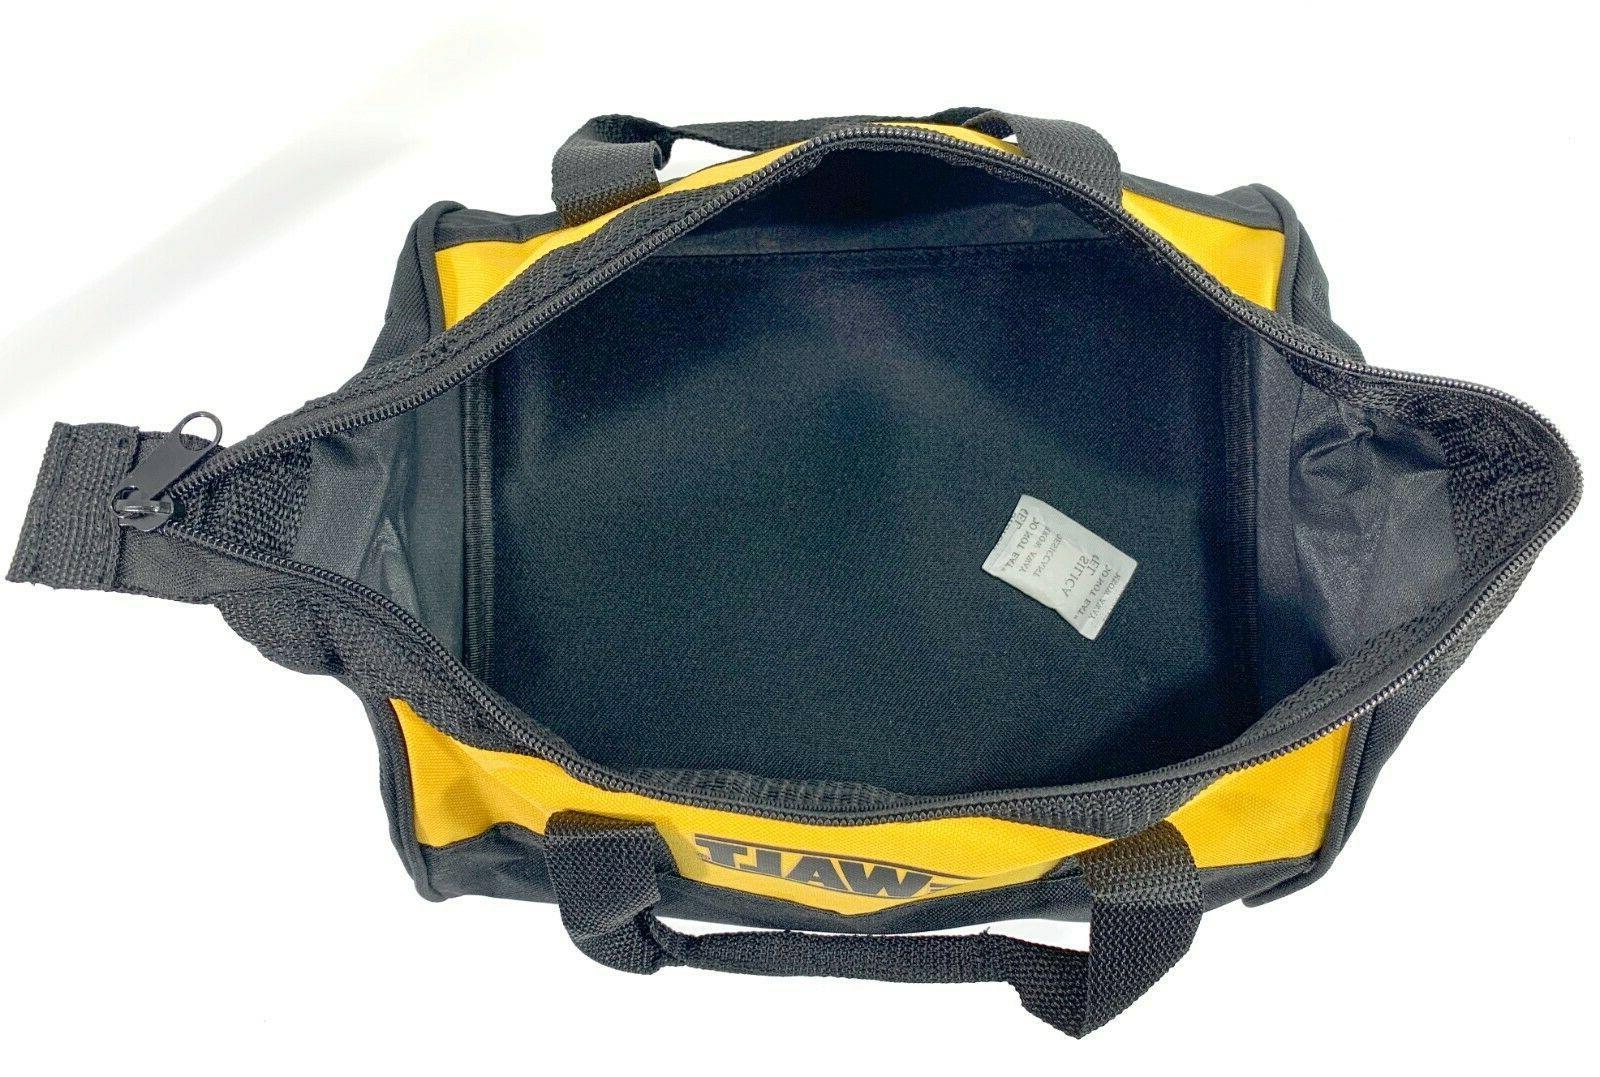 Dewalt Heavy Duty Double Zippered Tool Bag 9 x 7 NEW